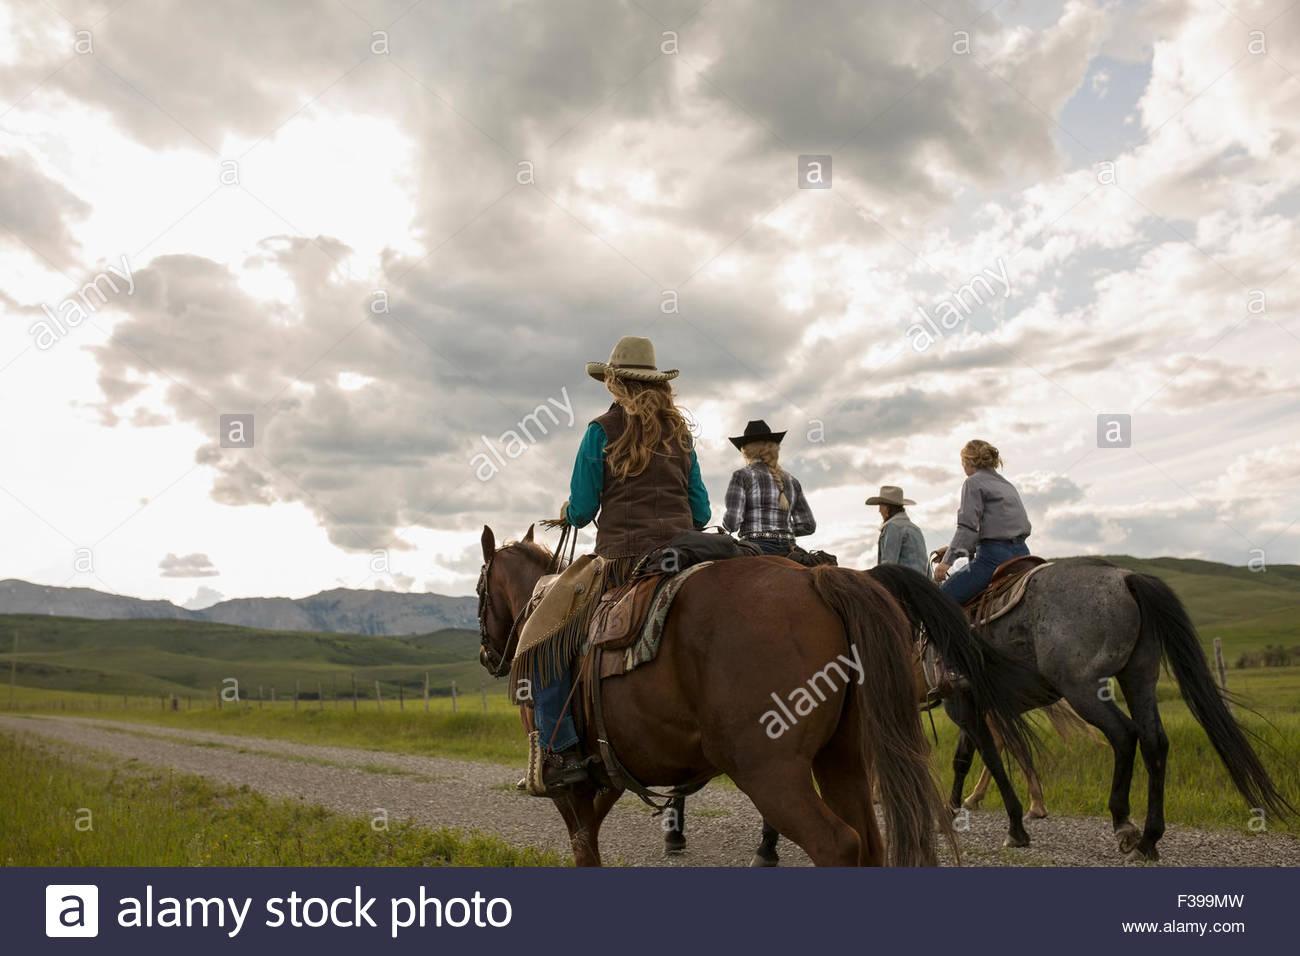 Female ranchers horseback riding on remote road - Stock Image